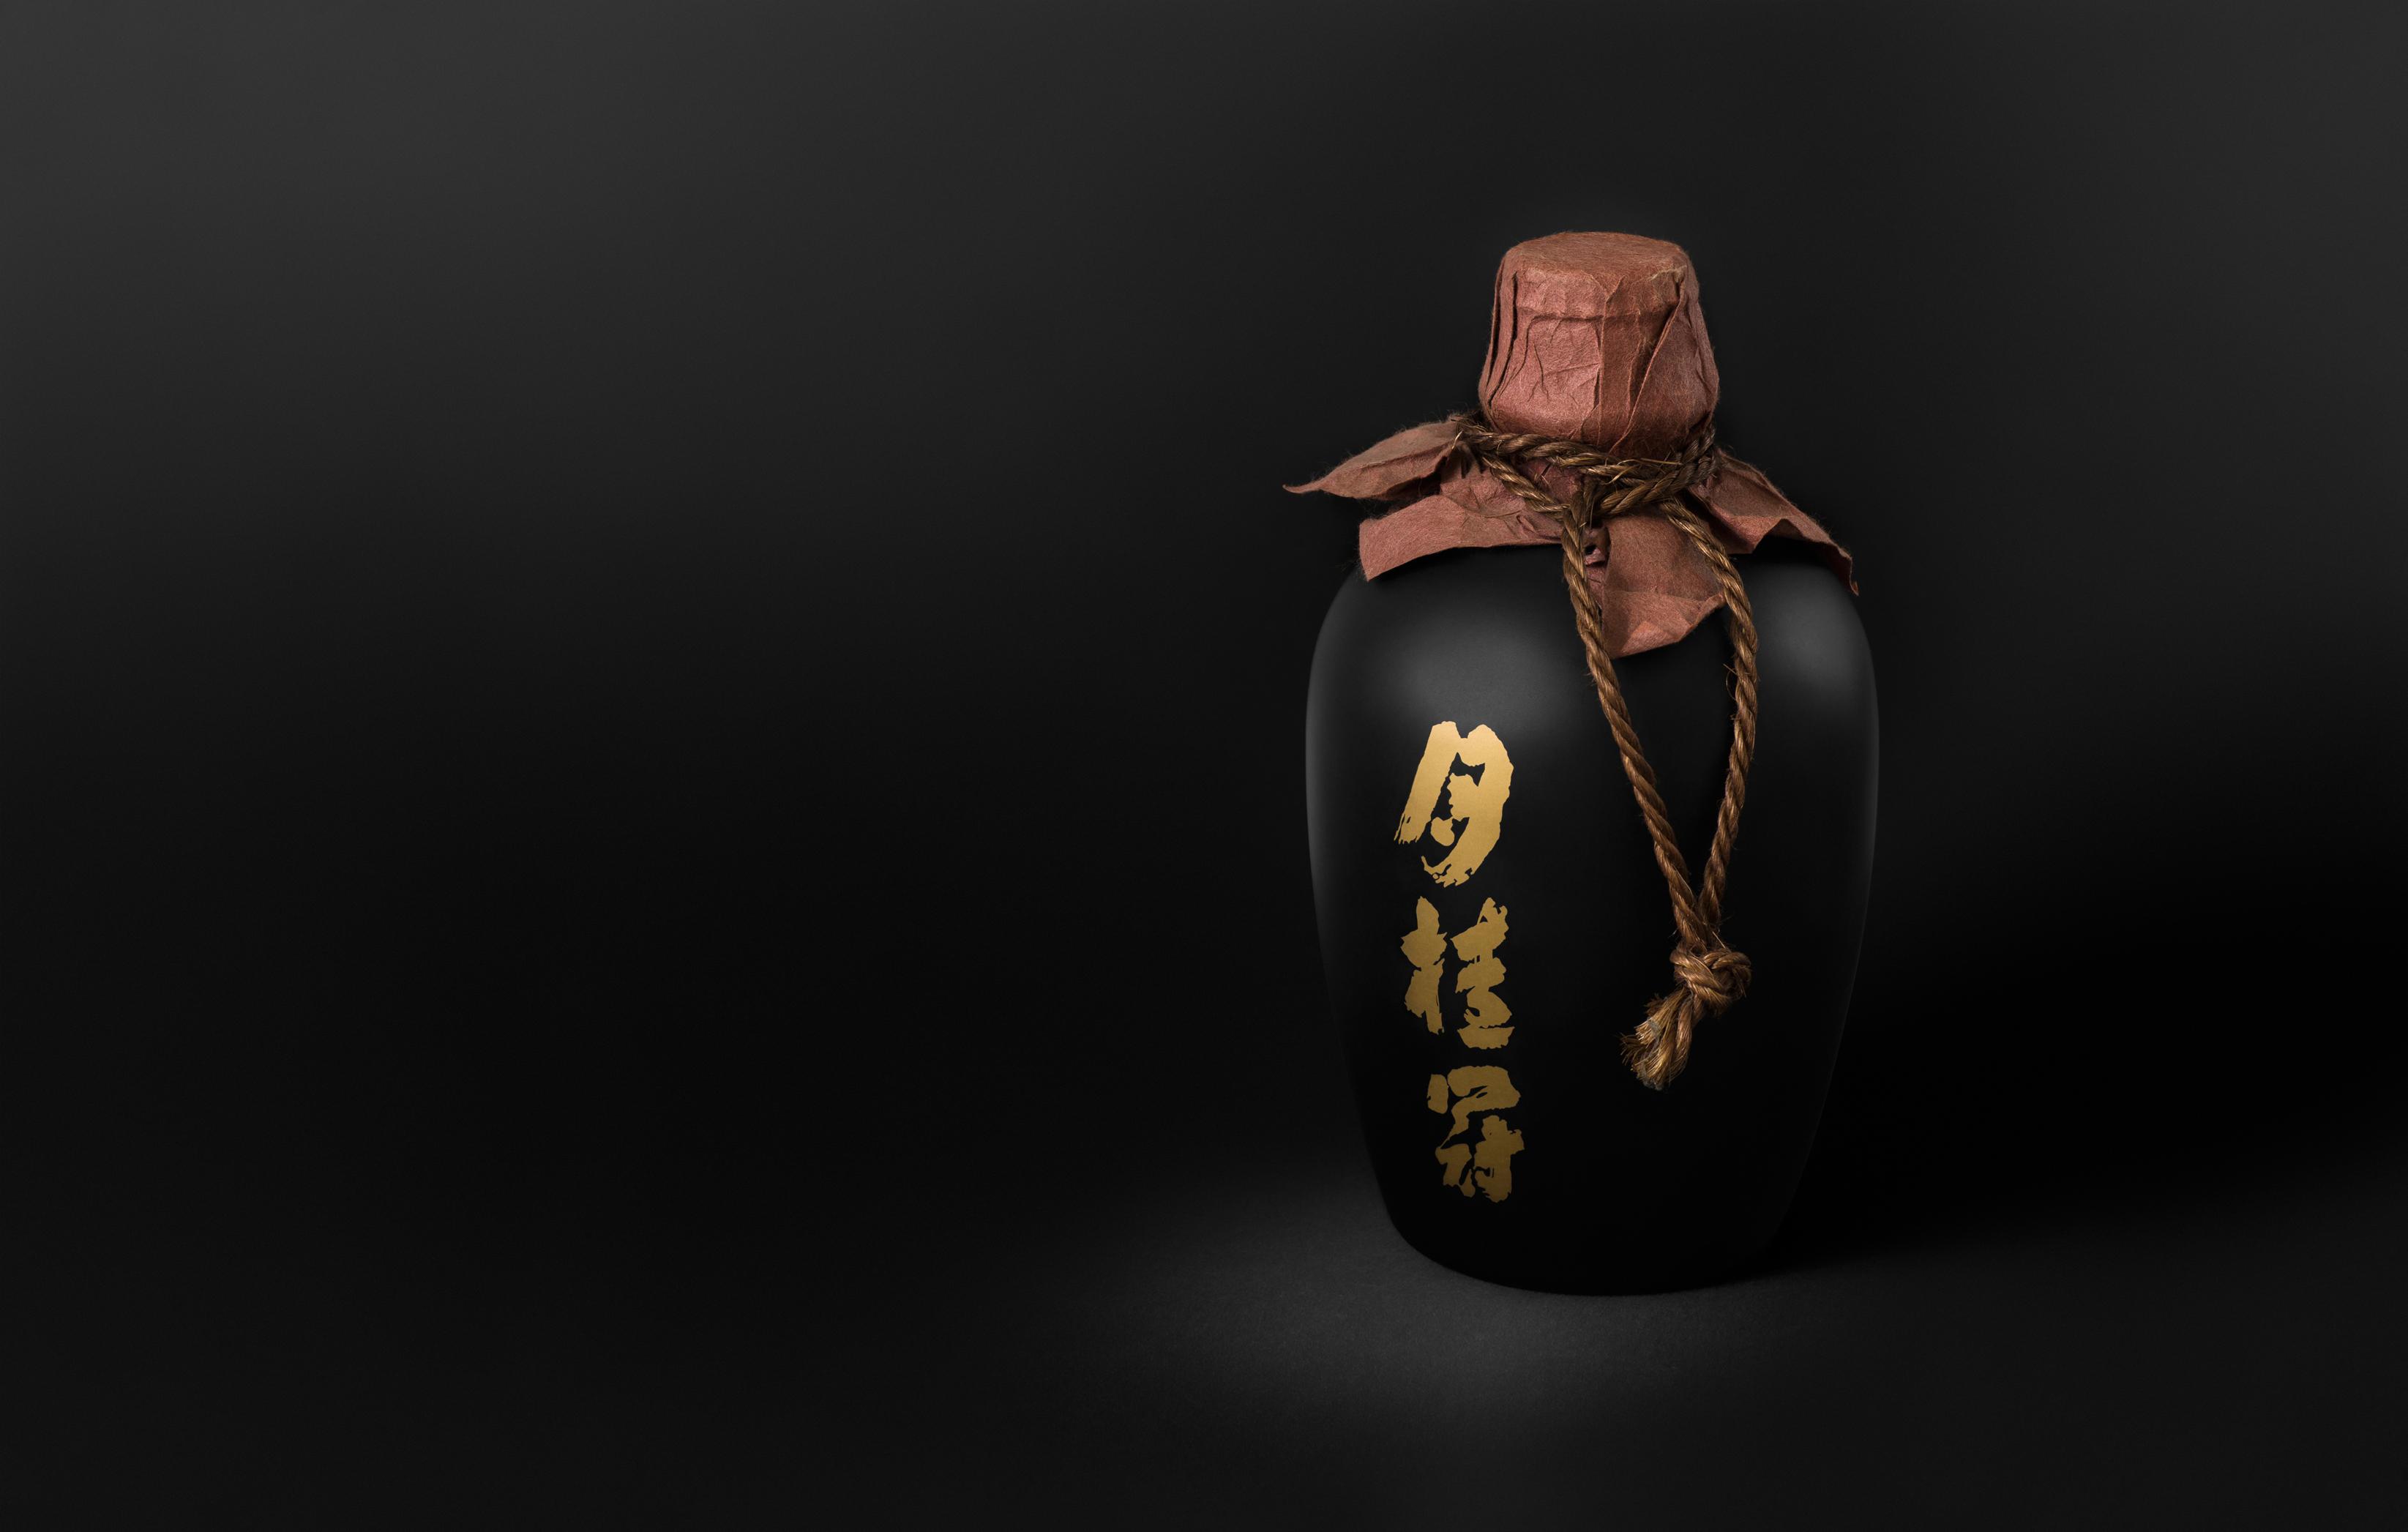 Wallpaper Jepang Hitam Minum Emas Alkohol Studio Merek Demi Cahaya Latar Belakang Minuman Keras Iklan Rasa Wallpaper Komputer Botol Kaca Produk Hidup Masih Fotografi Promosi Gekkeikan Product Design 3290x2093